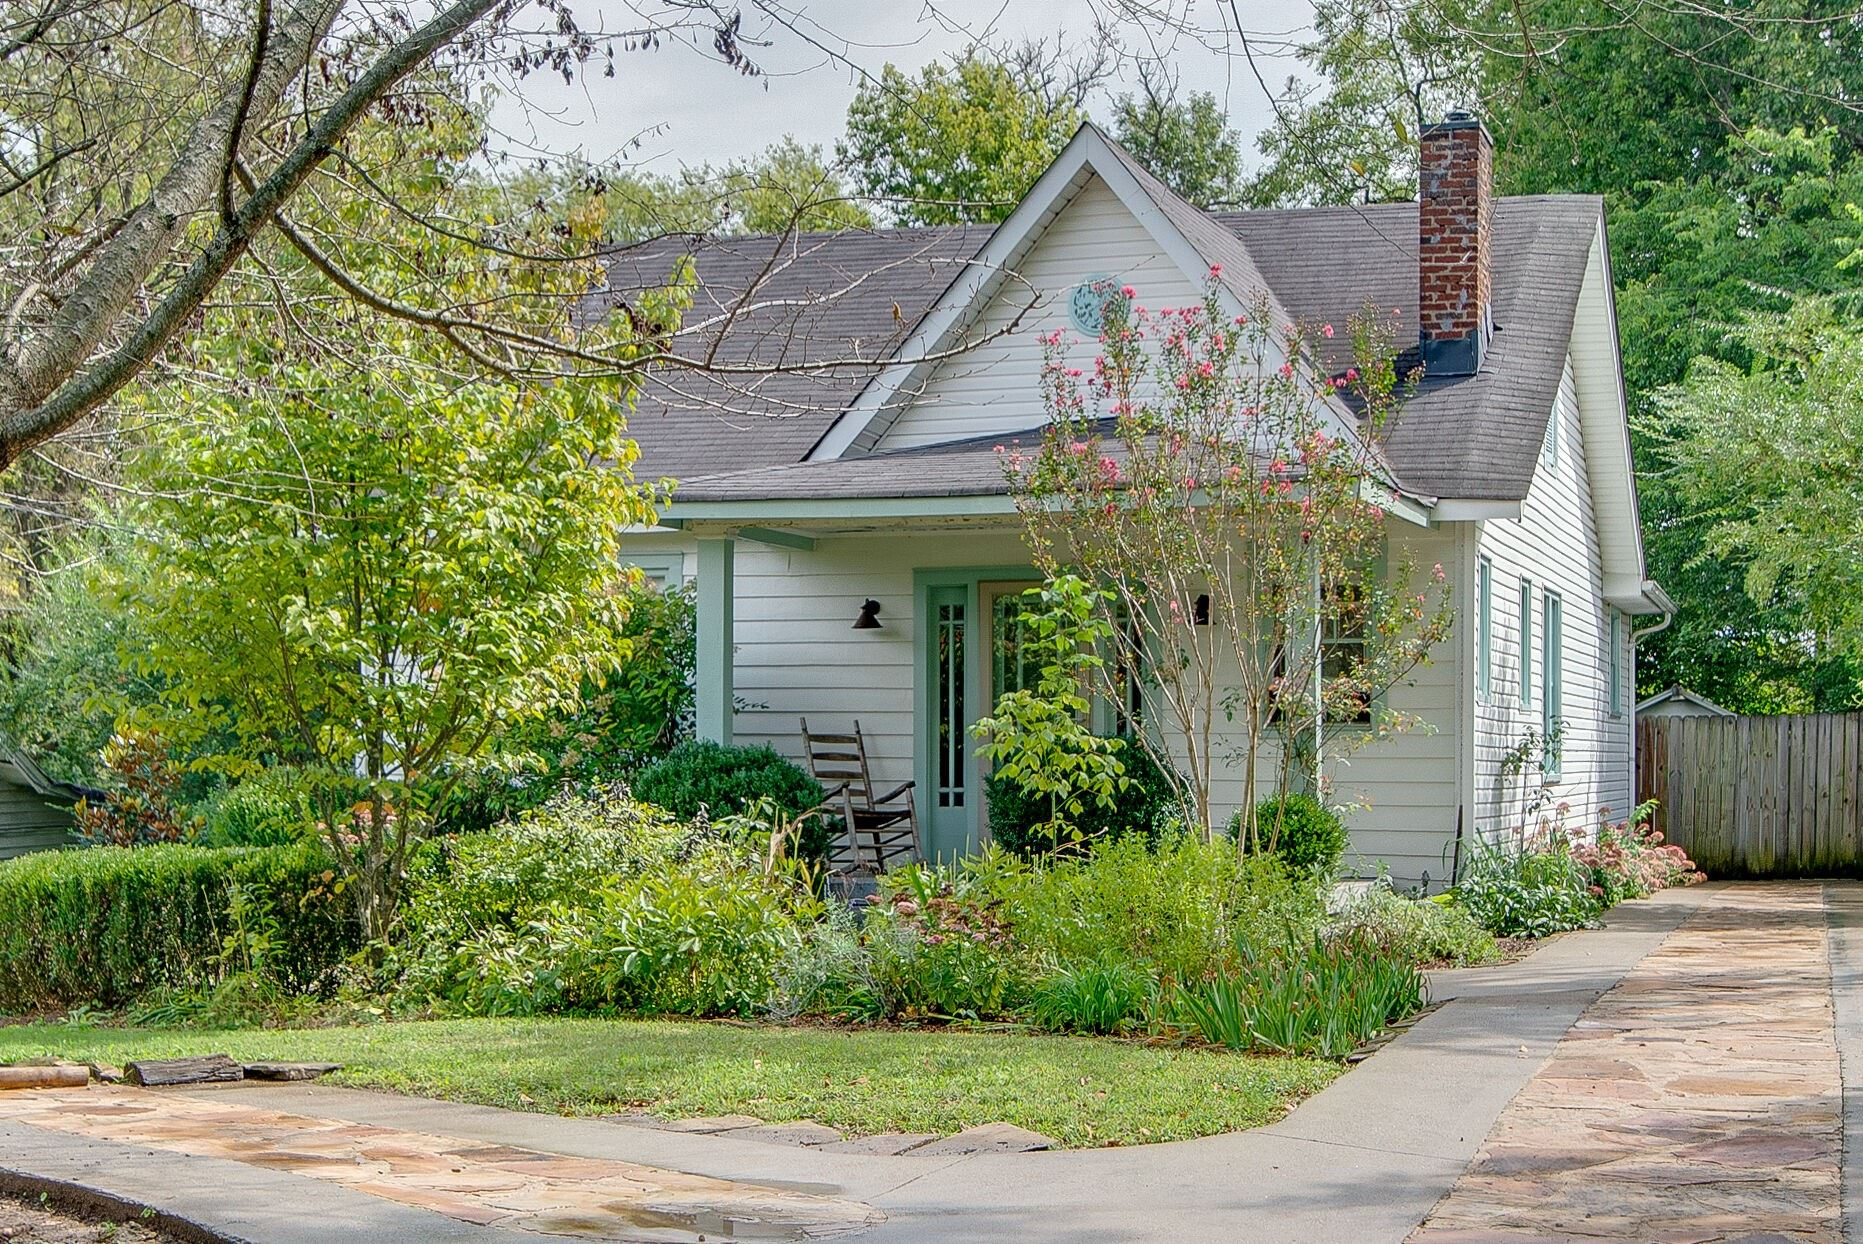 Photo of 3922 Baxter Ave, Nashville, TN 37216 (MLS # 2192972)